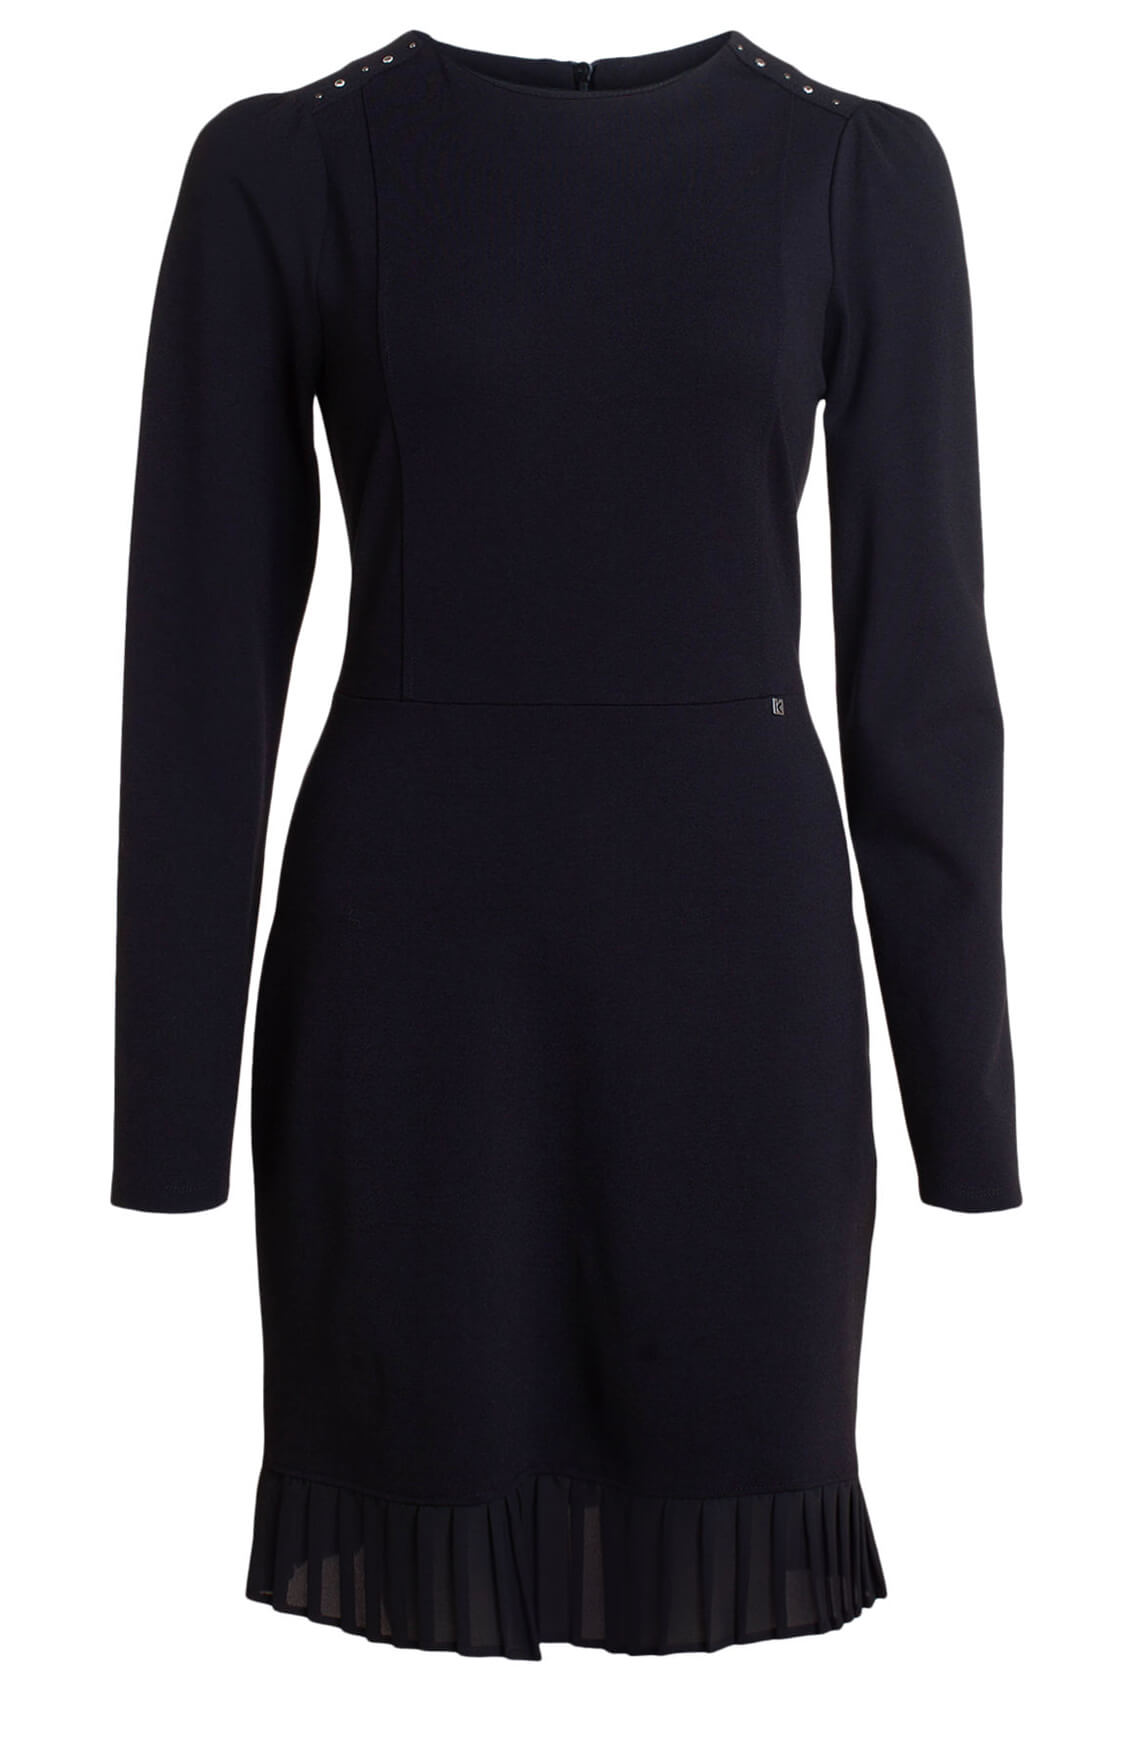 Kocca Dames Ortega jurk zwart